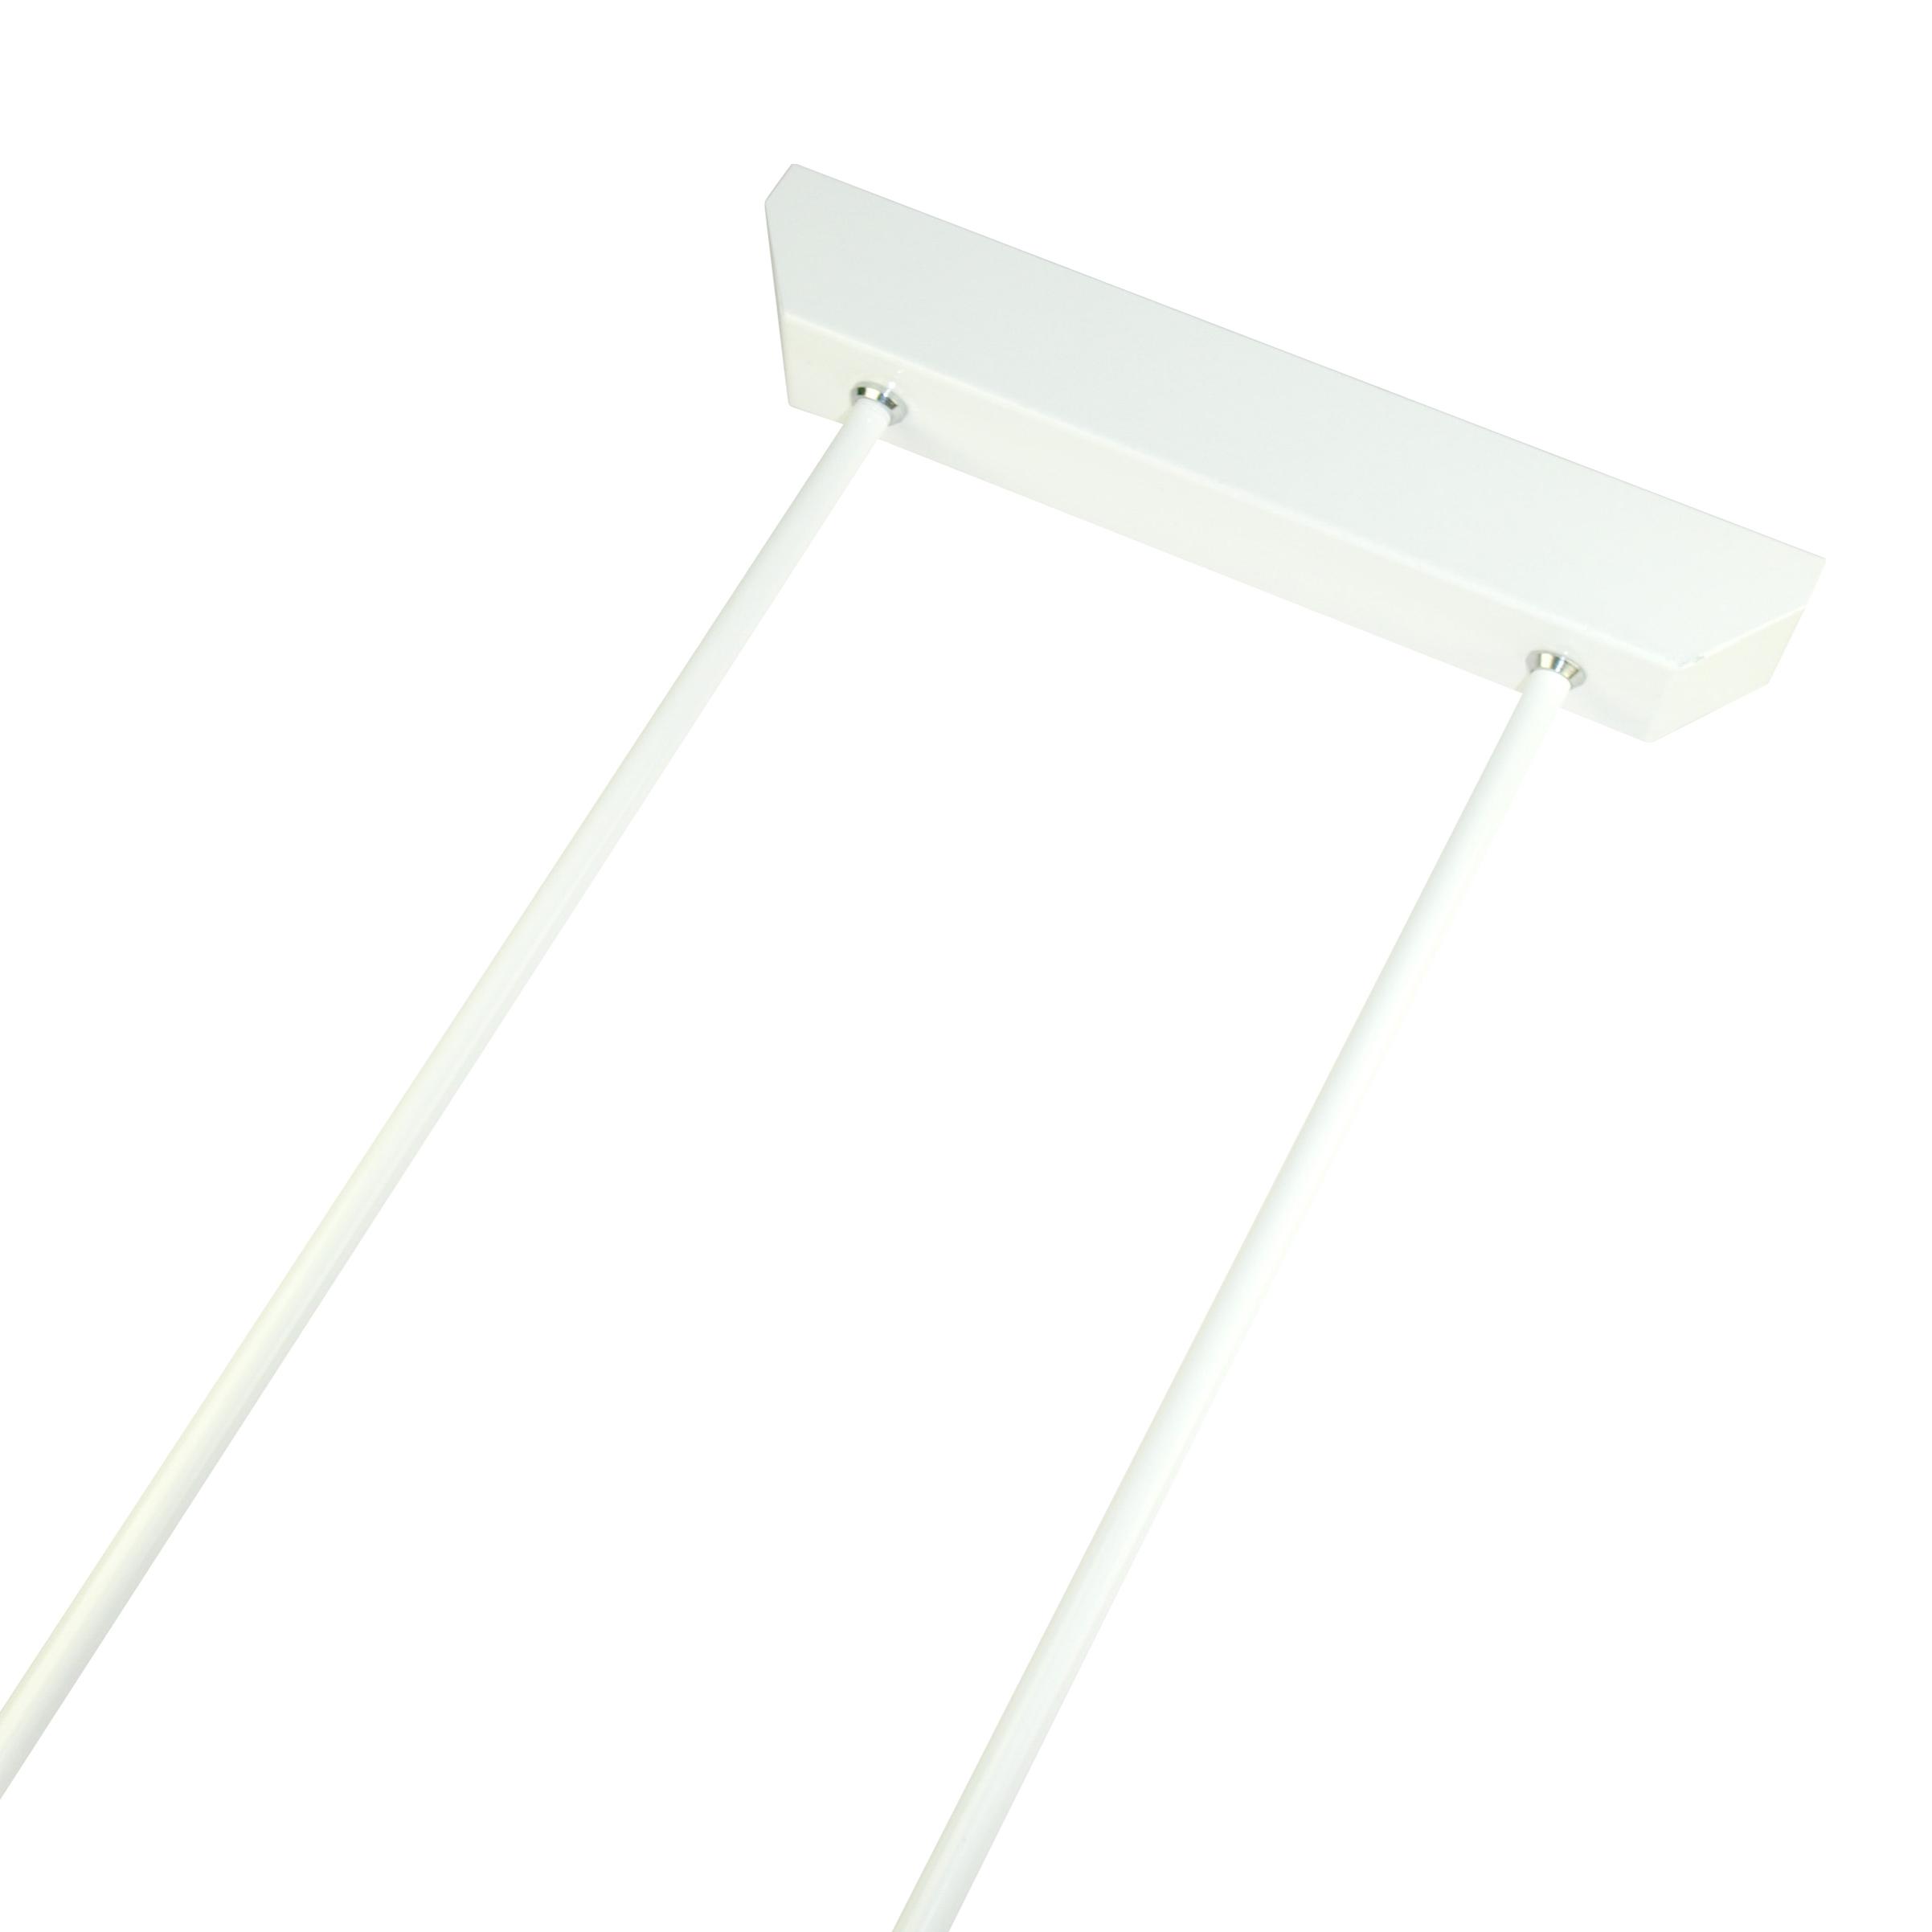 1 Stk Design-Pendelpaar 500mm weiß verdrahtet NL2DW-----